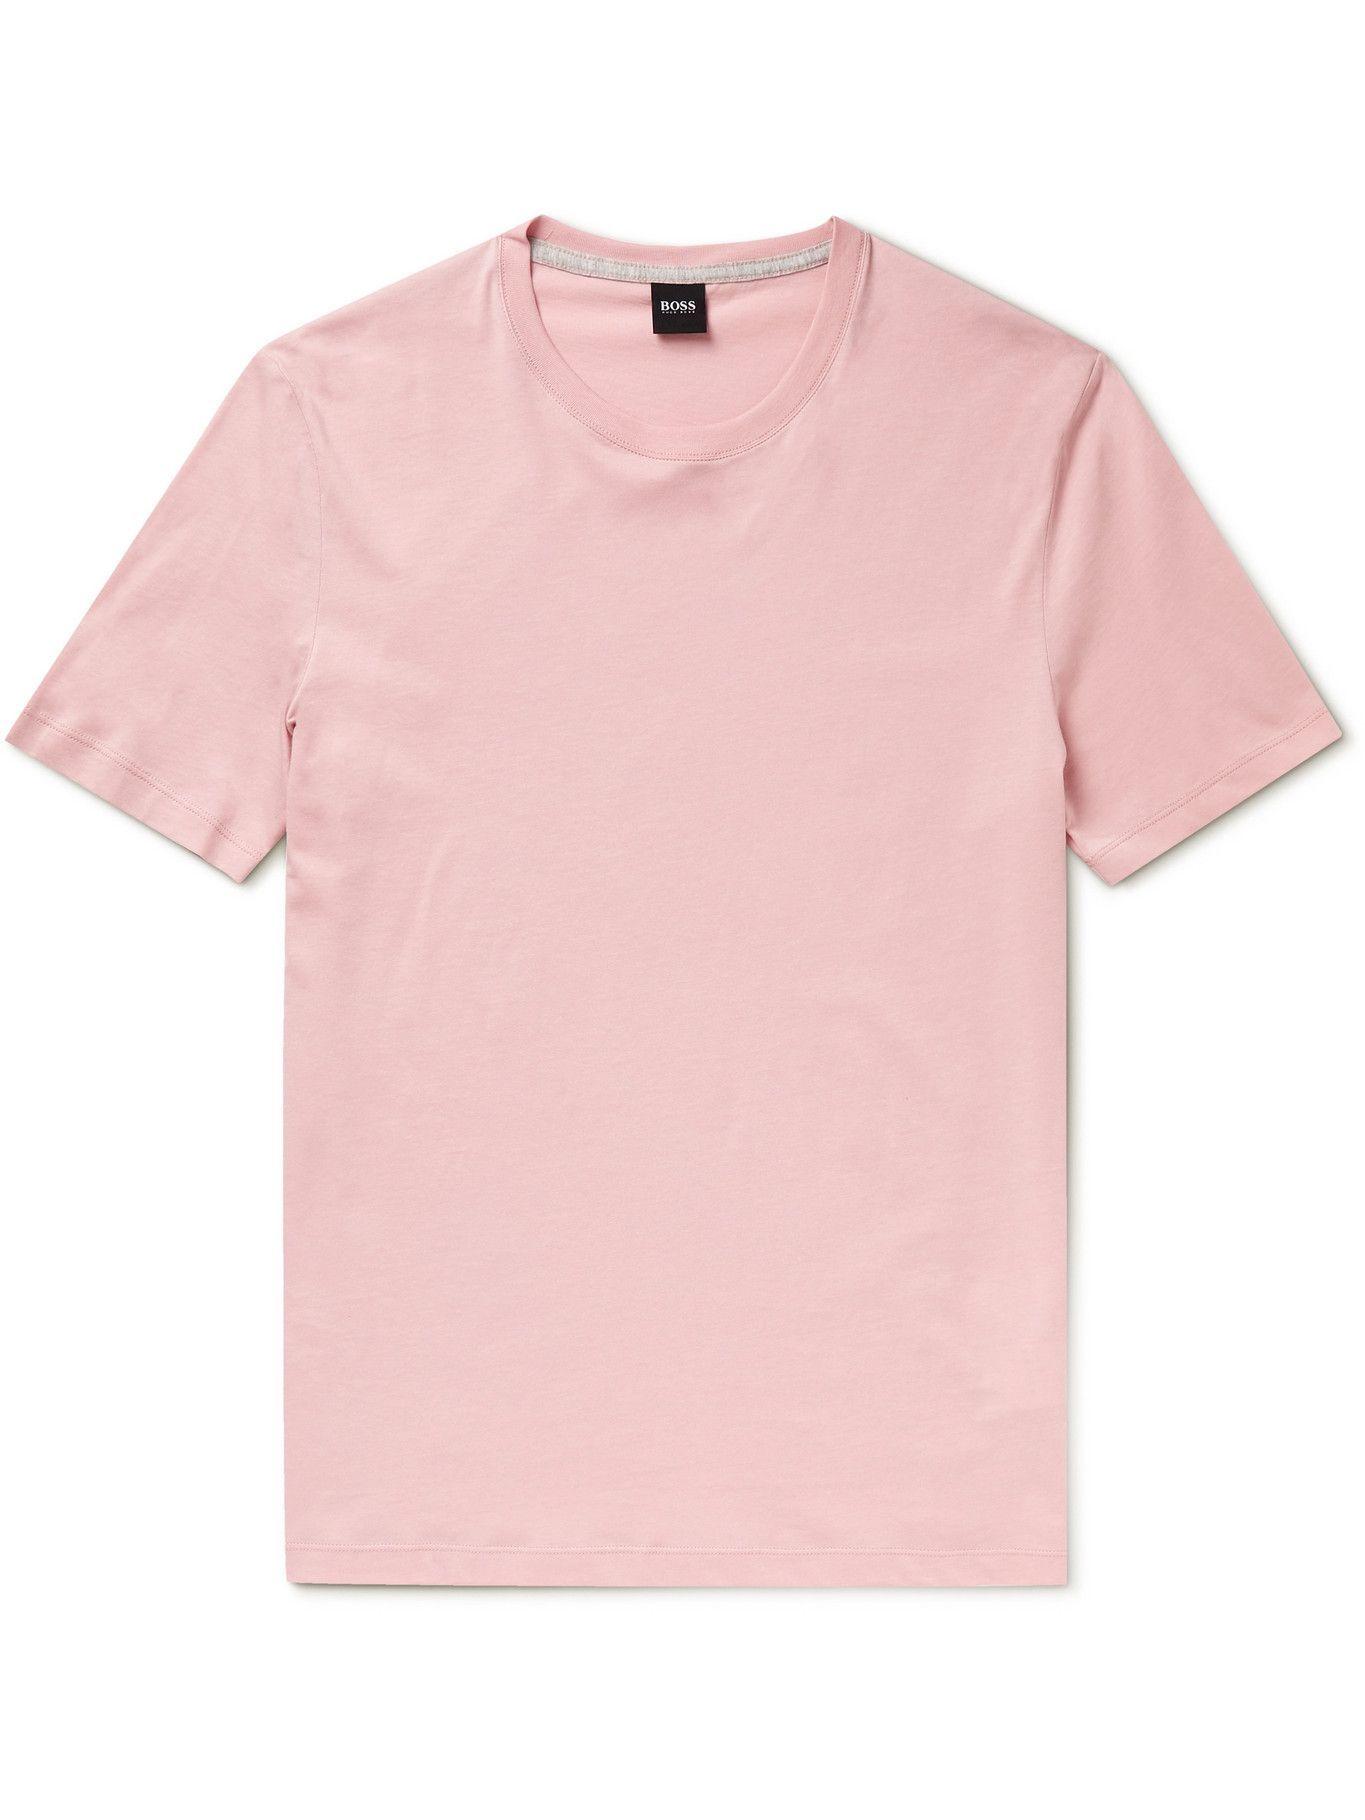 HUGO BOSS - Slim-Fit Cotton-Jersey T-Shirt - Pink